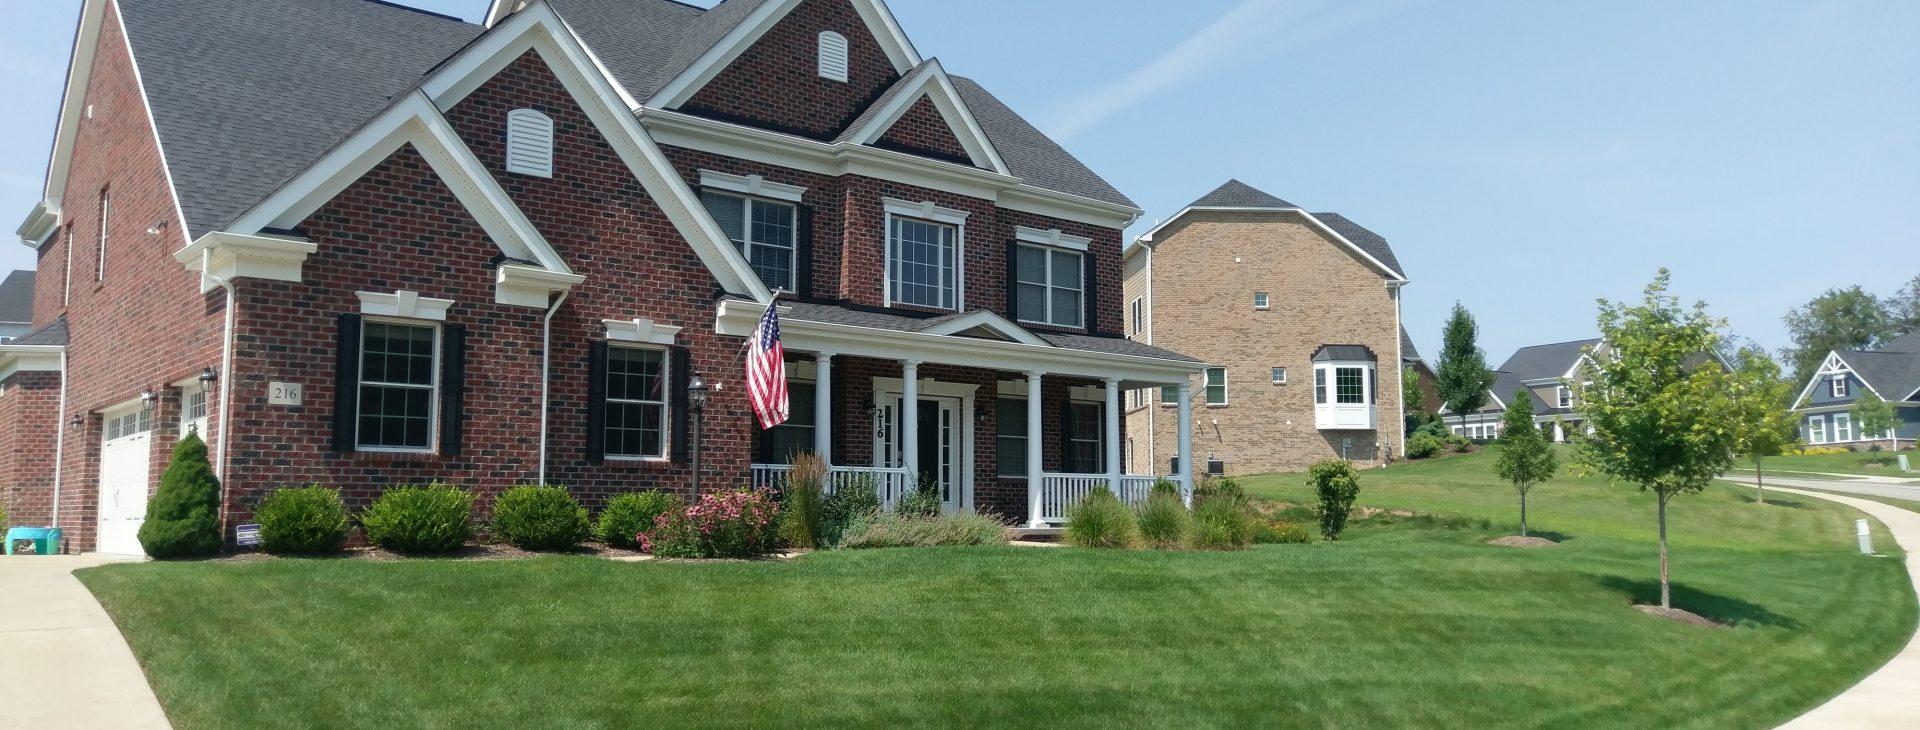 New Home Lawn & Landscape Renovation